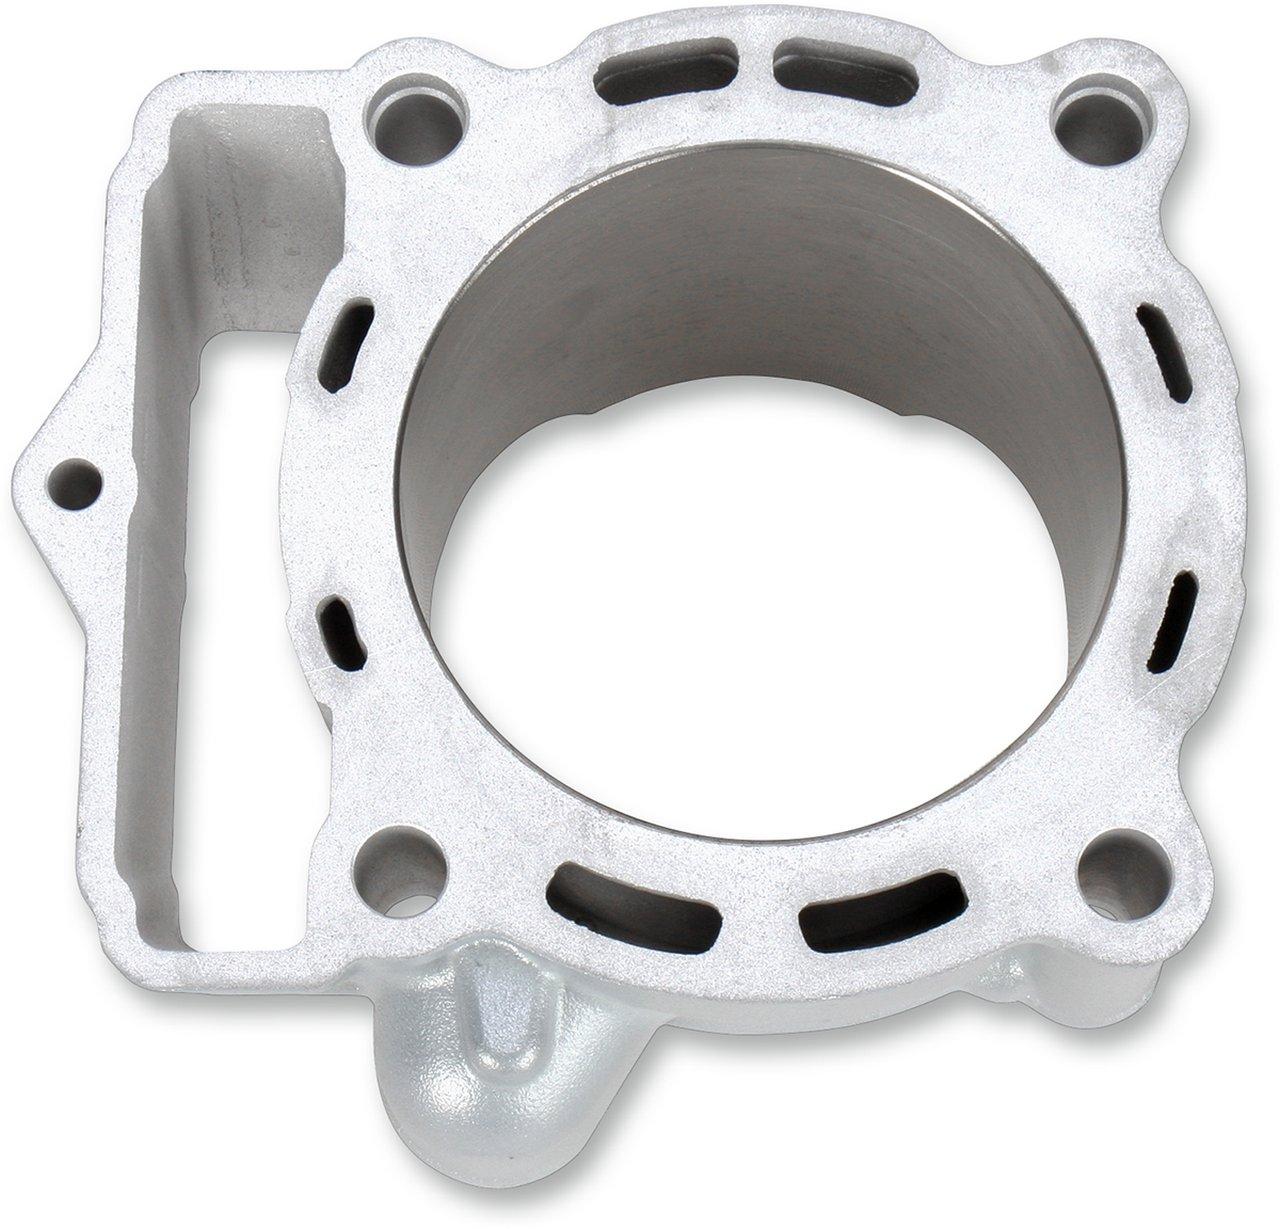 【MOOSE RACING】維修用汽缸 [0931-0464] - 「Webike-摩托百貨」